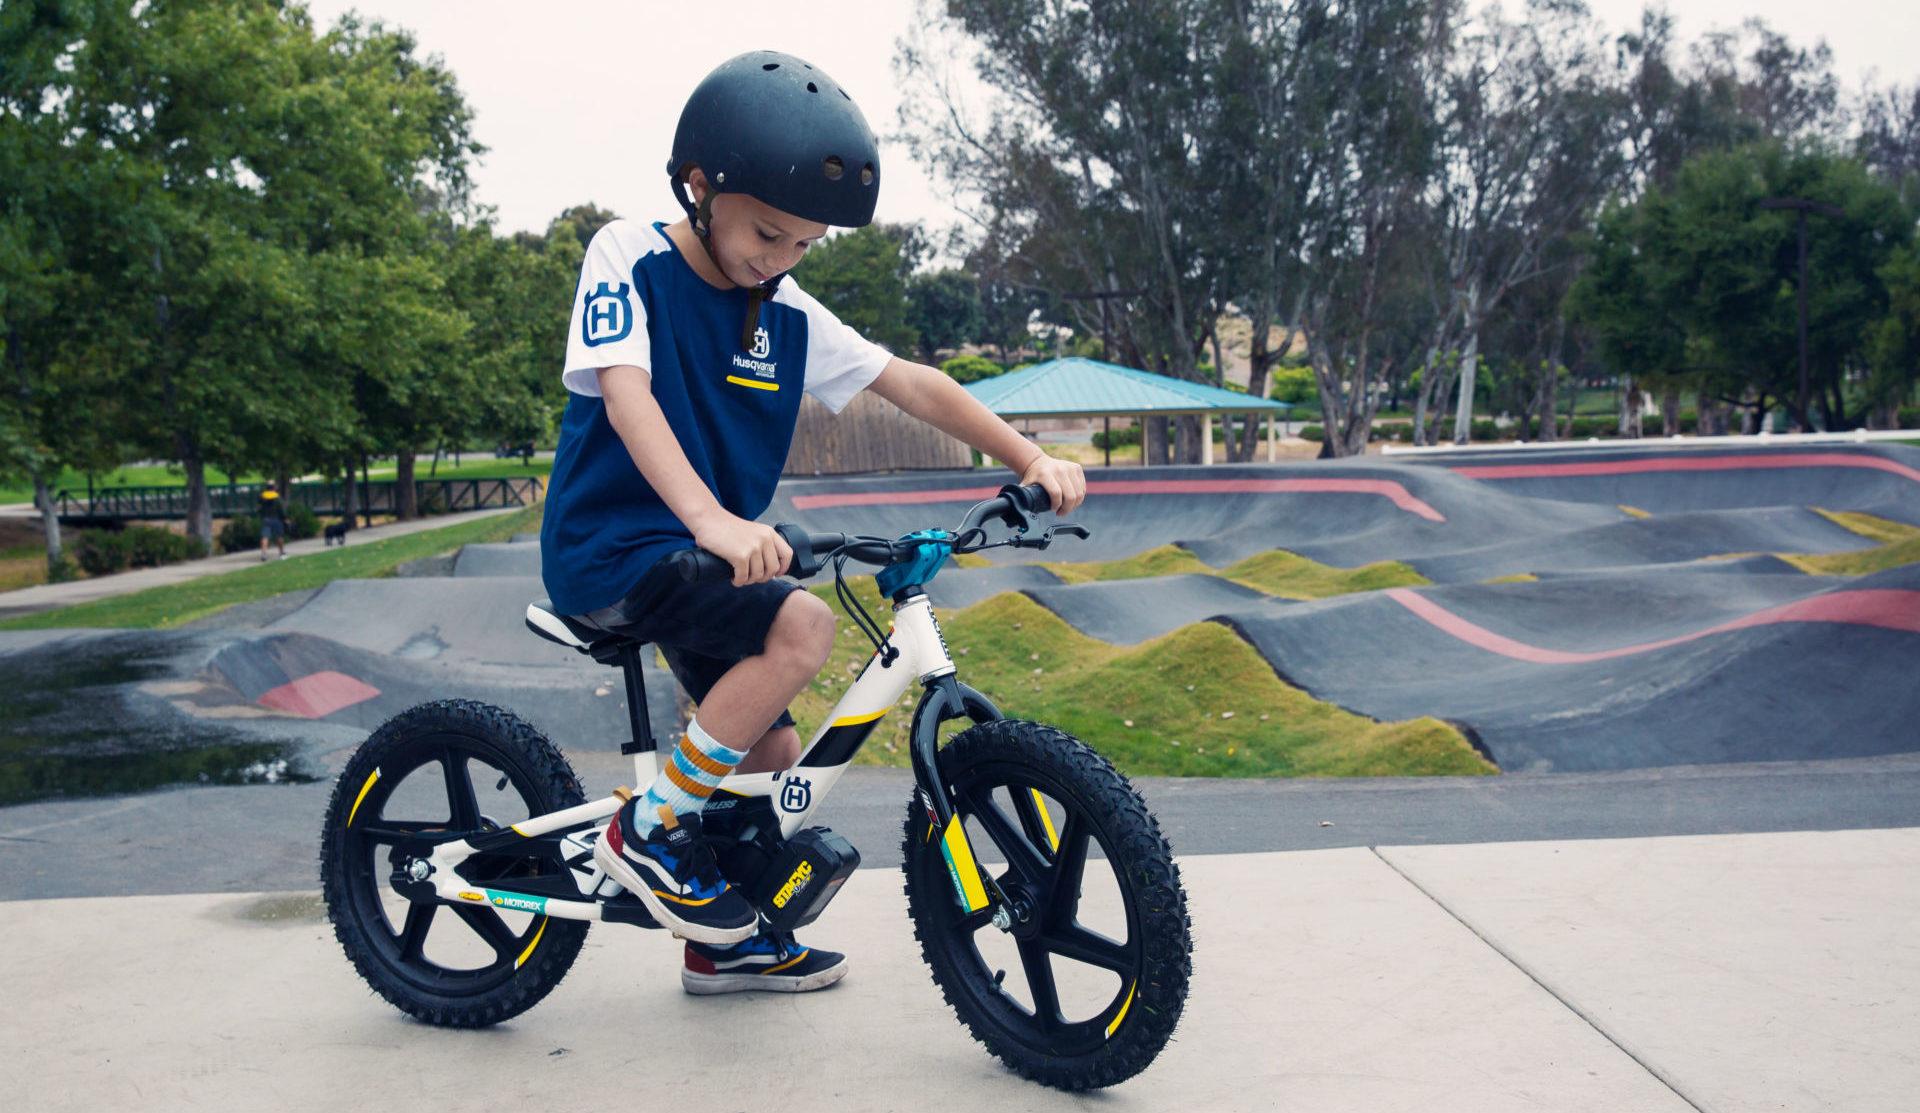 A young boy on a Husqvarna 16eDrive electric balance bike. Photo courtesy Husqvarna Motorcycles.